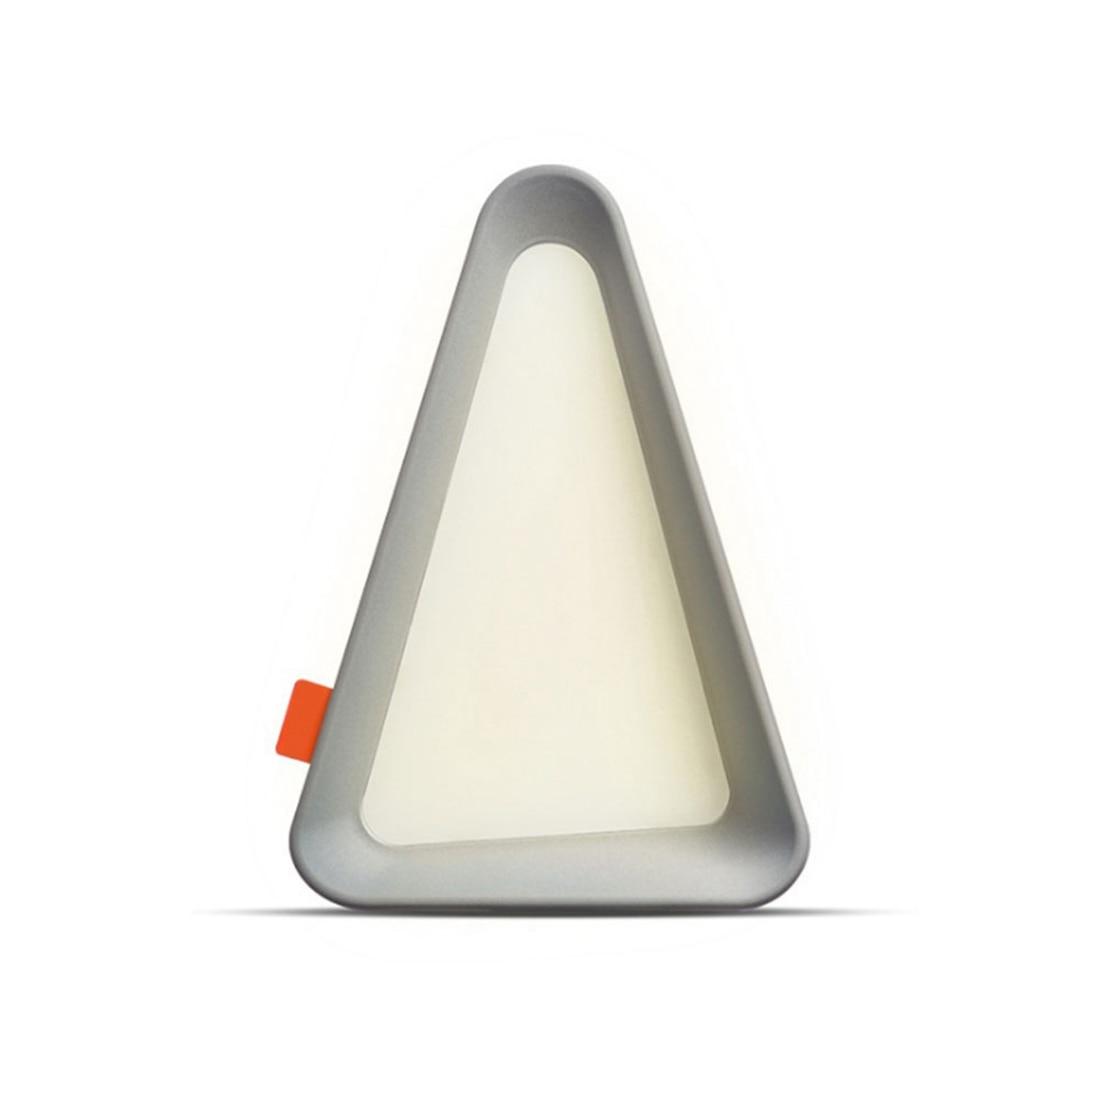 Gray Rock LED Flip Lamp Triangle-Design Desk Lamp Triangle-Design Originality Modern Table Lamp USB Charge LED Fashion Ni